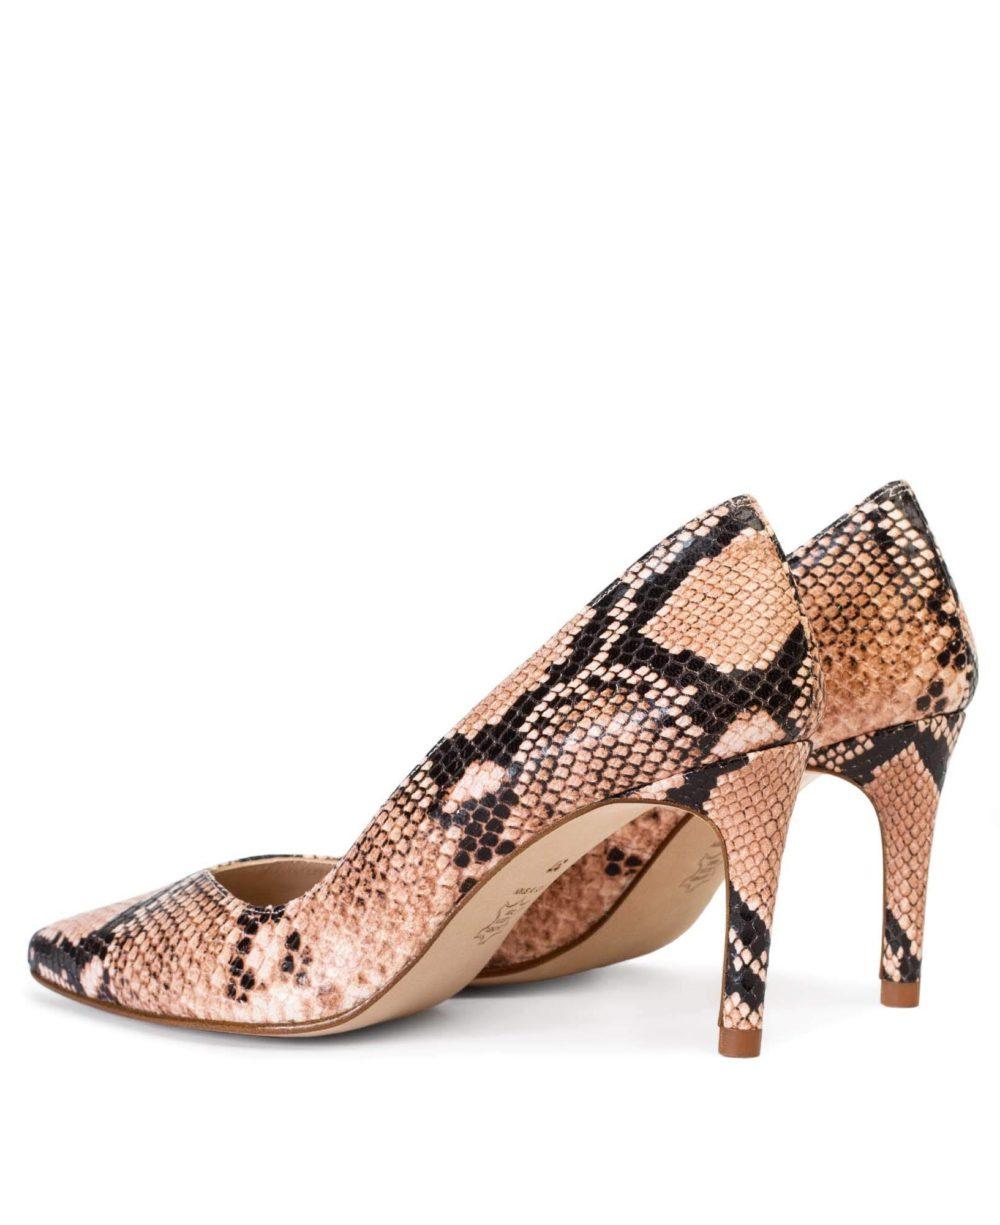 zapato-salon-animal-print-serpiente